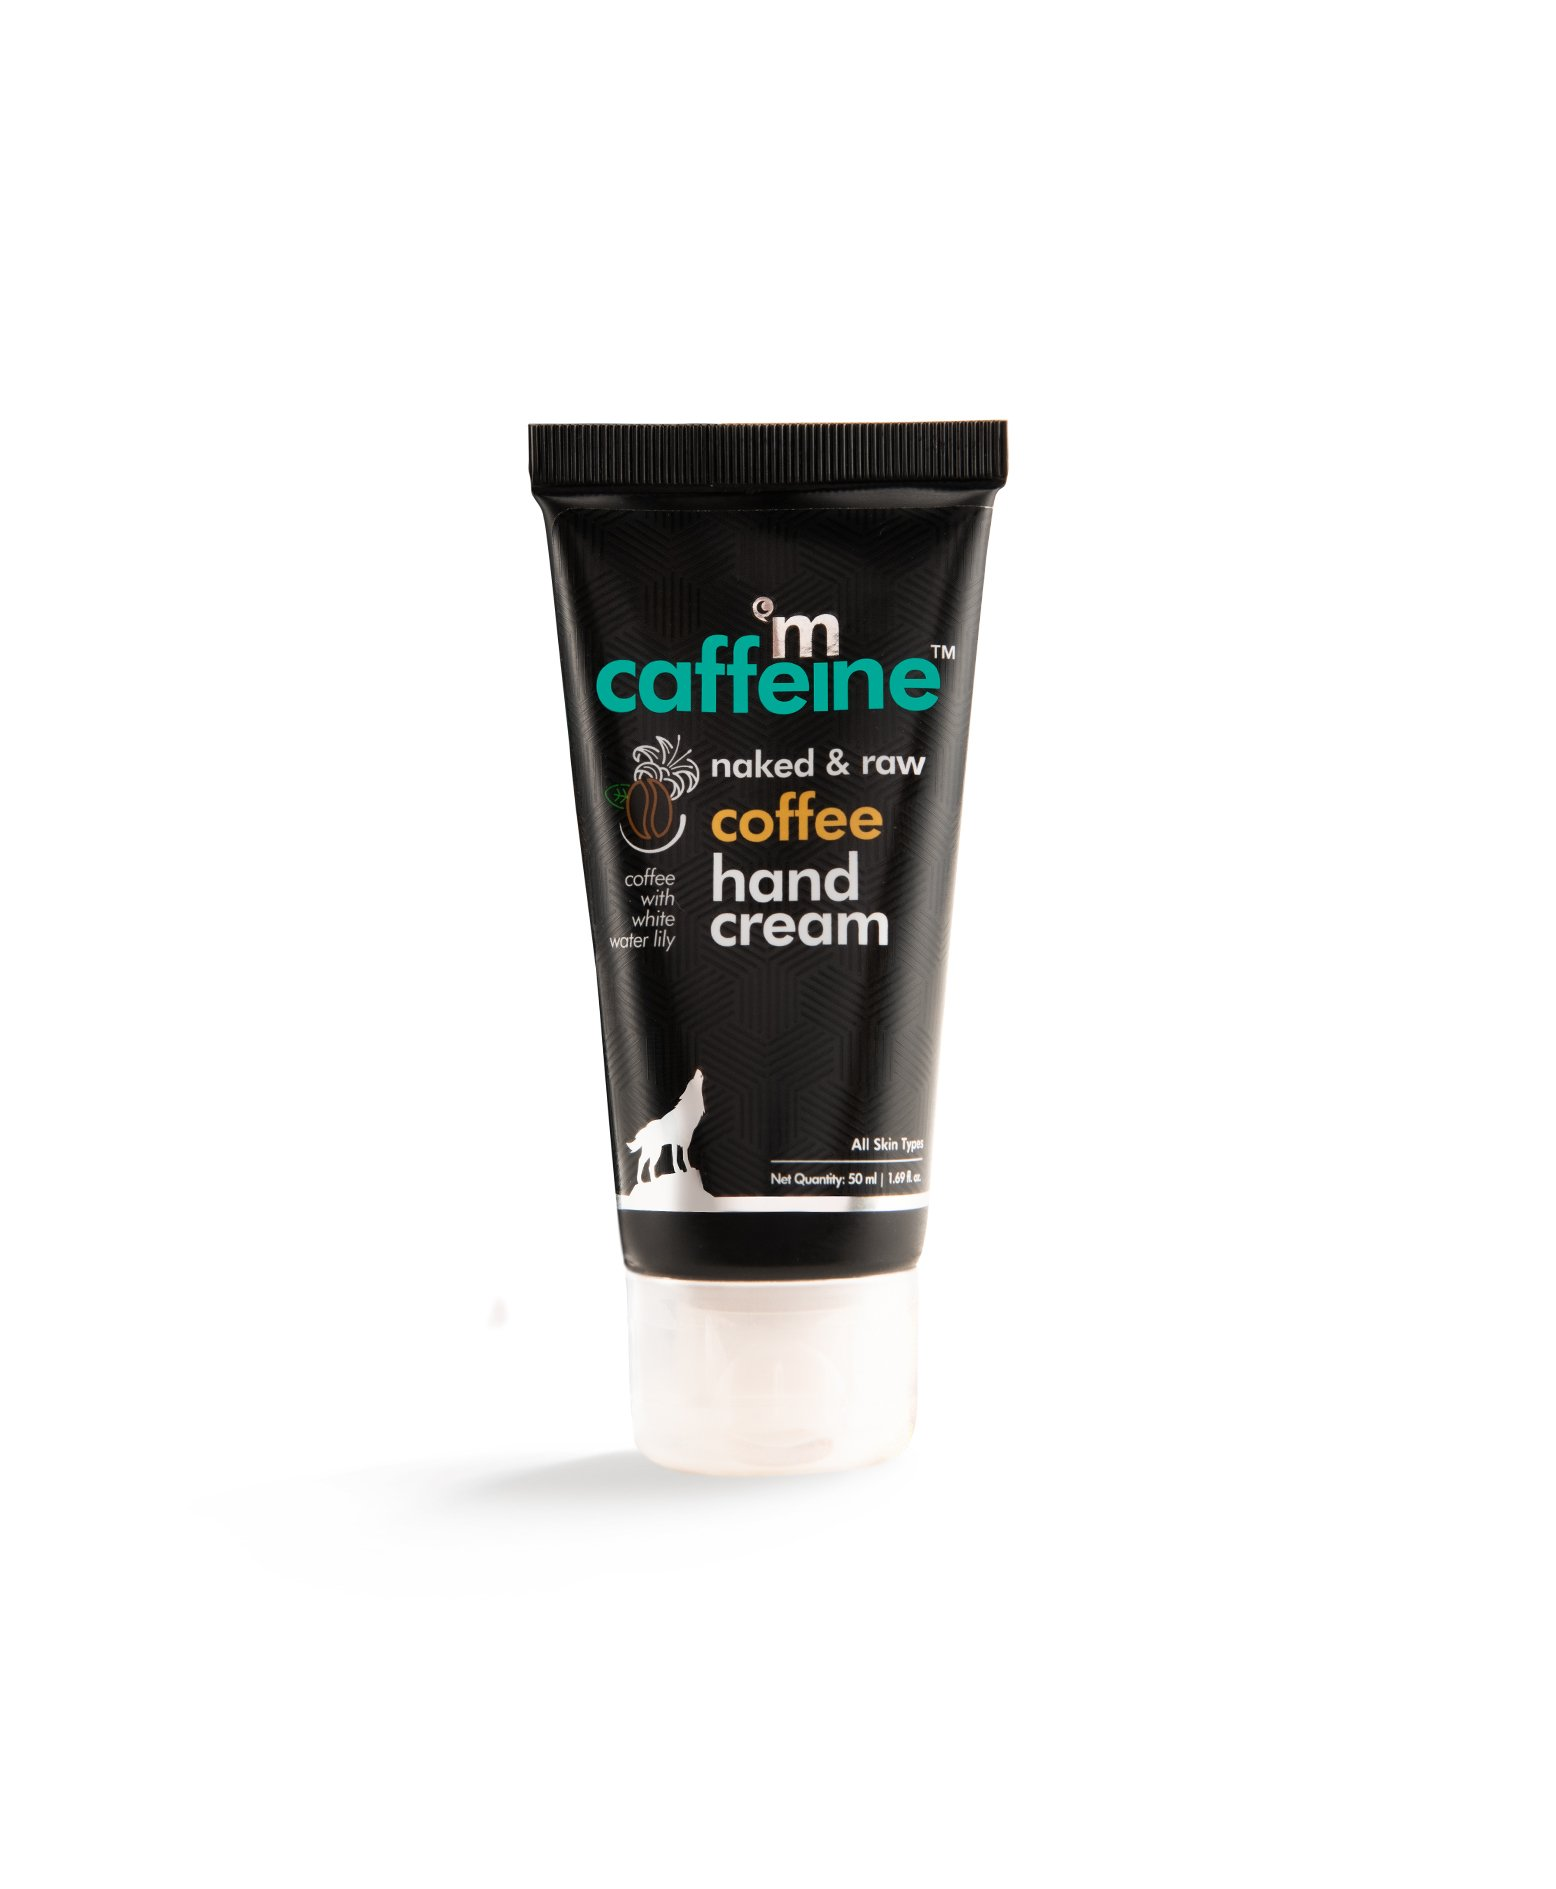 Naked & Raw Coffee Hand Cream, 50 ml